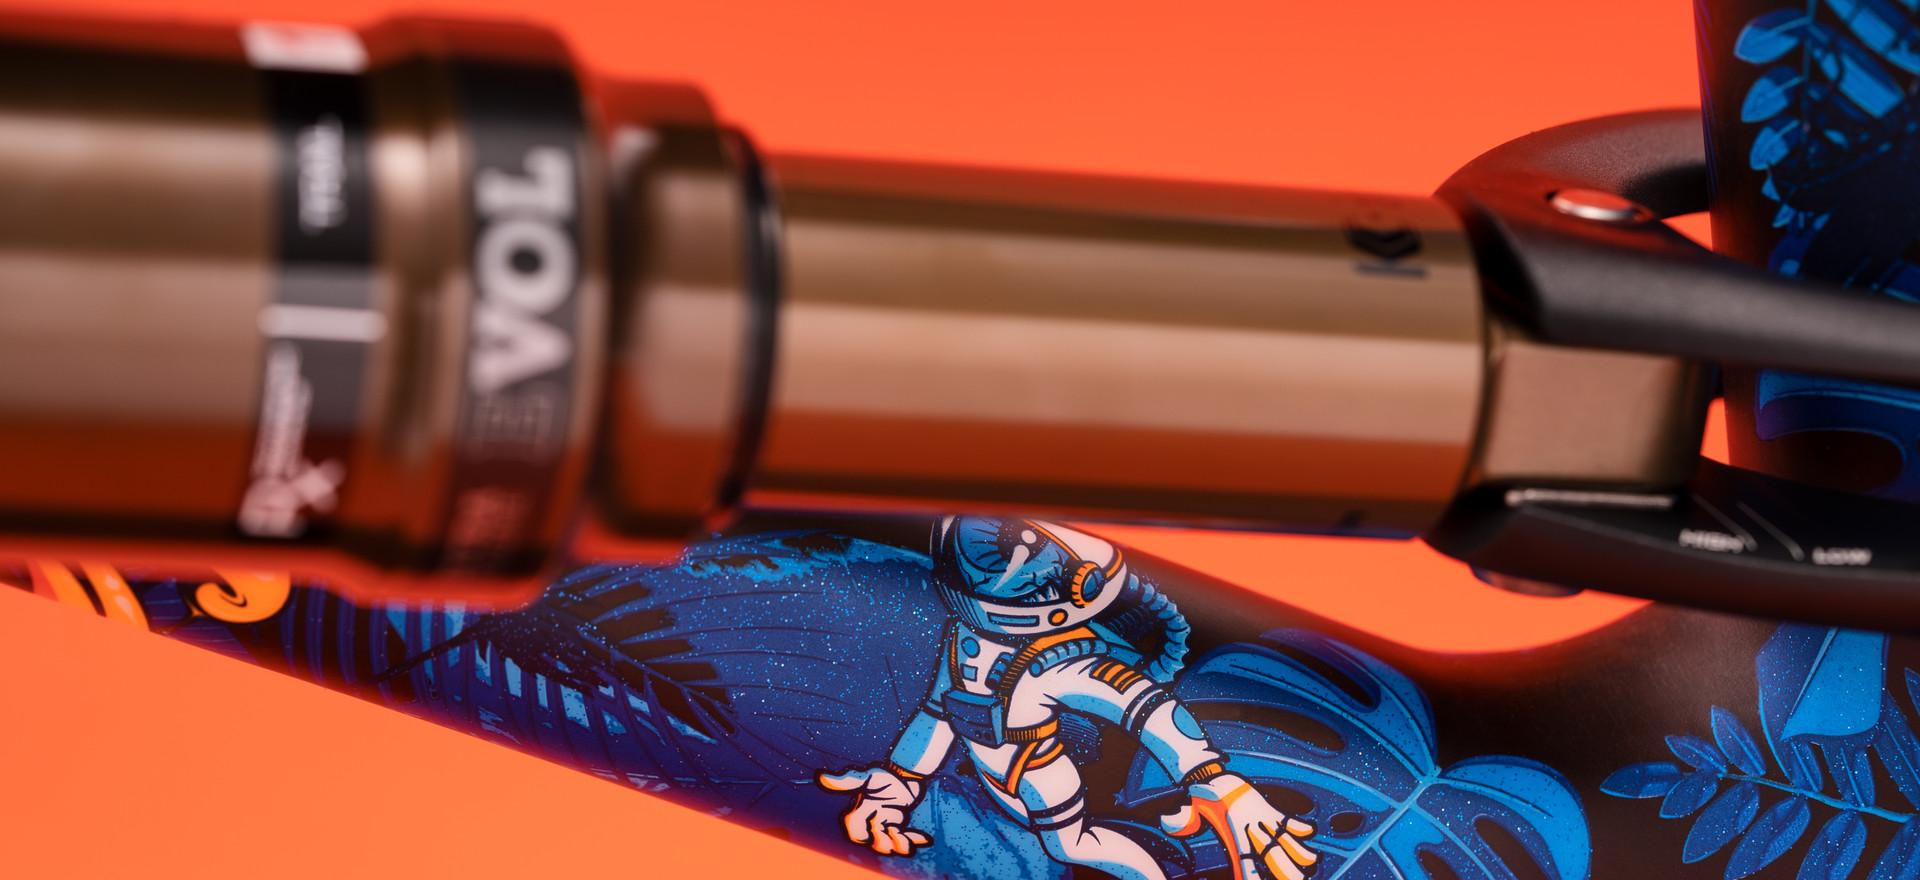 Cadre S-Works Turbo Levo Troy Lee Designs LTD